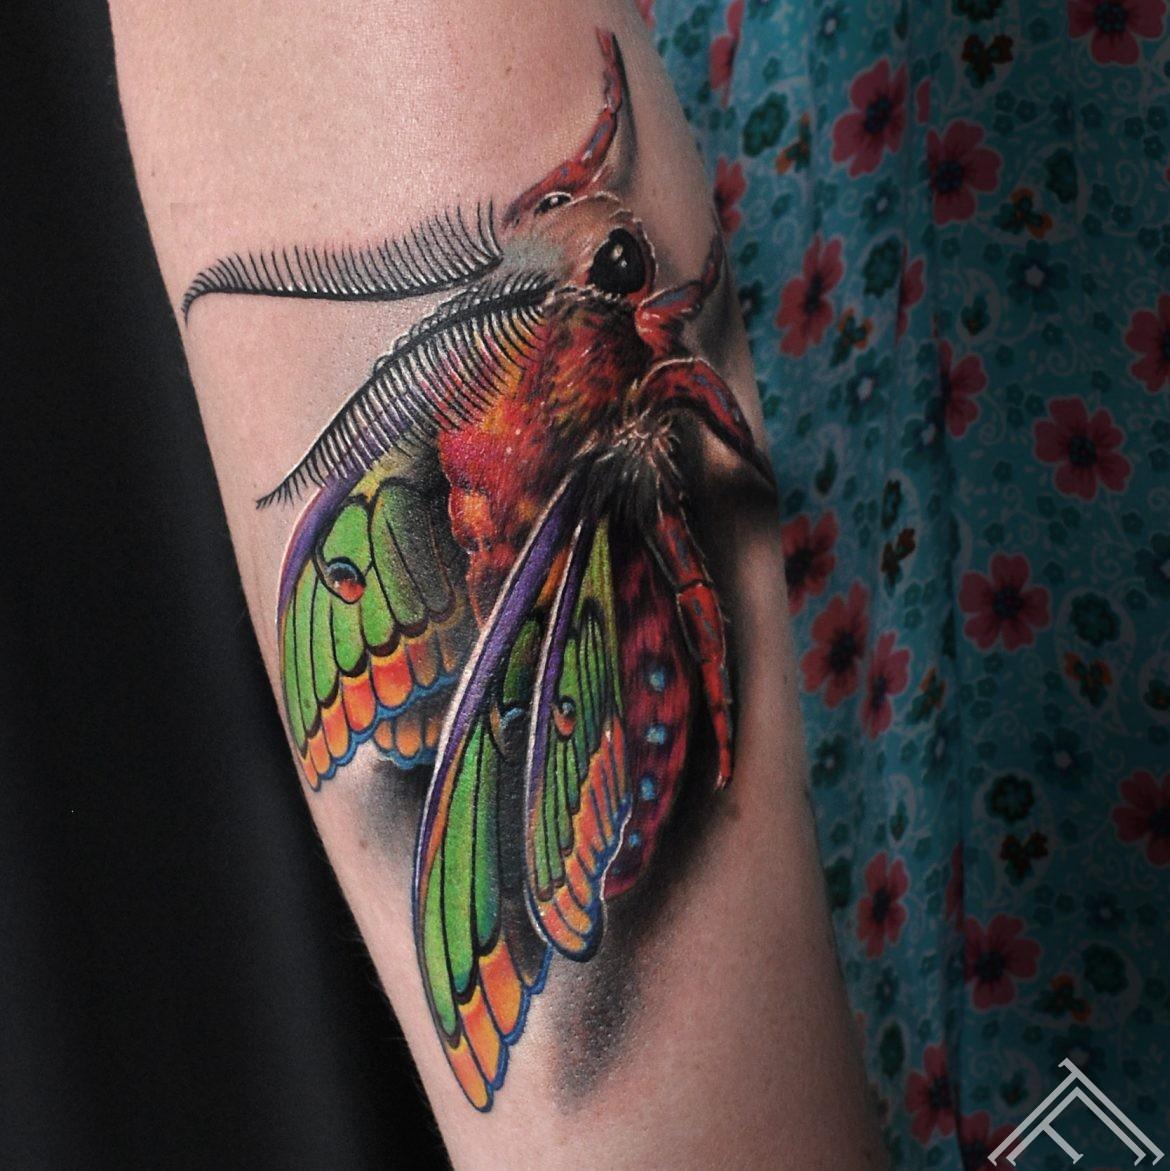 meadow-flowers-tattoo-tattoofrequency-marispavlo-riga-close up